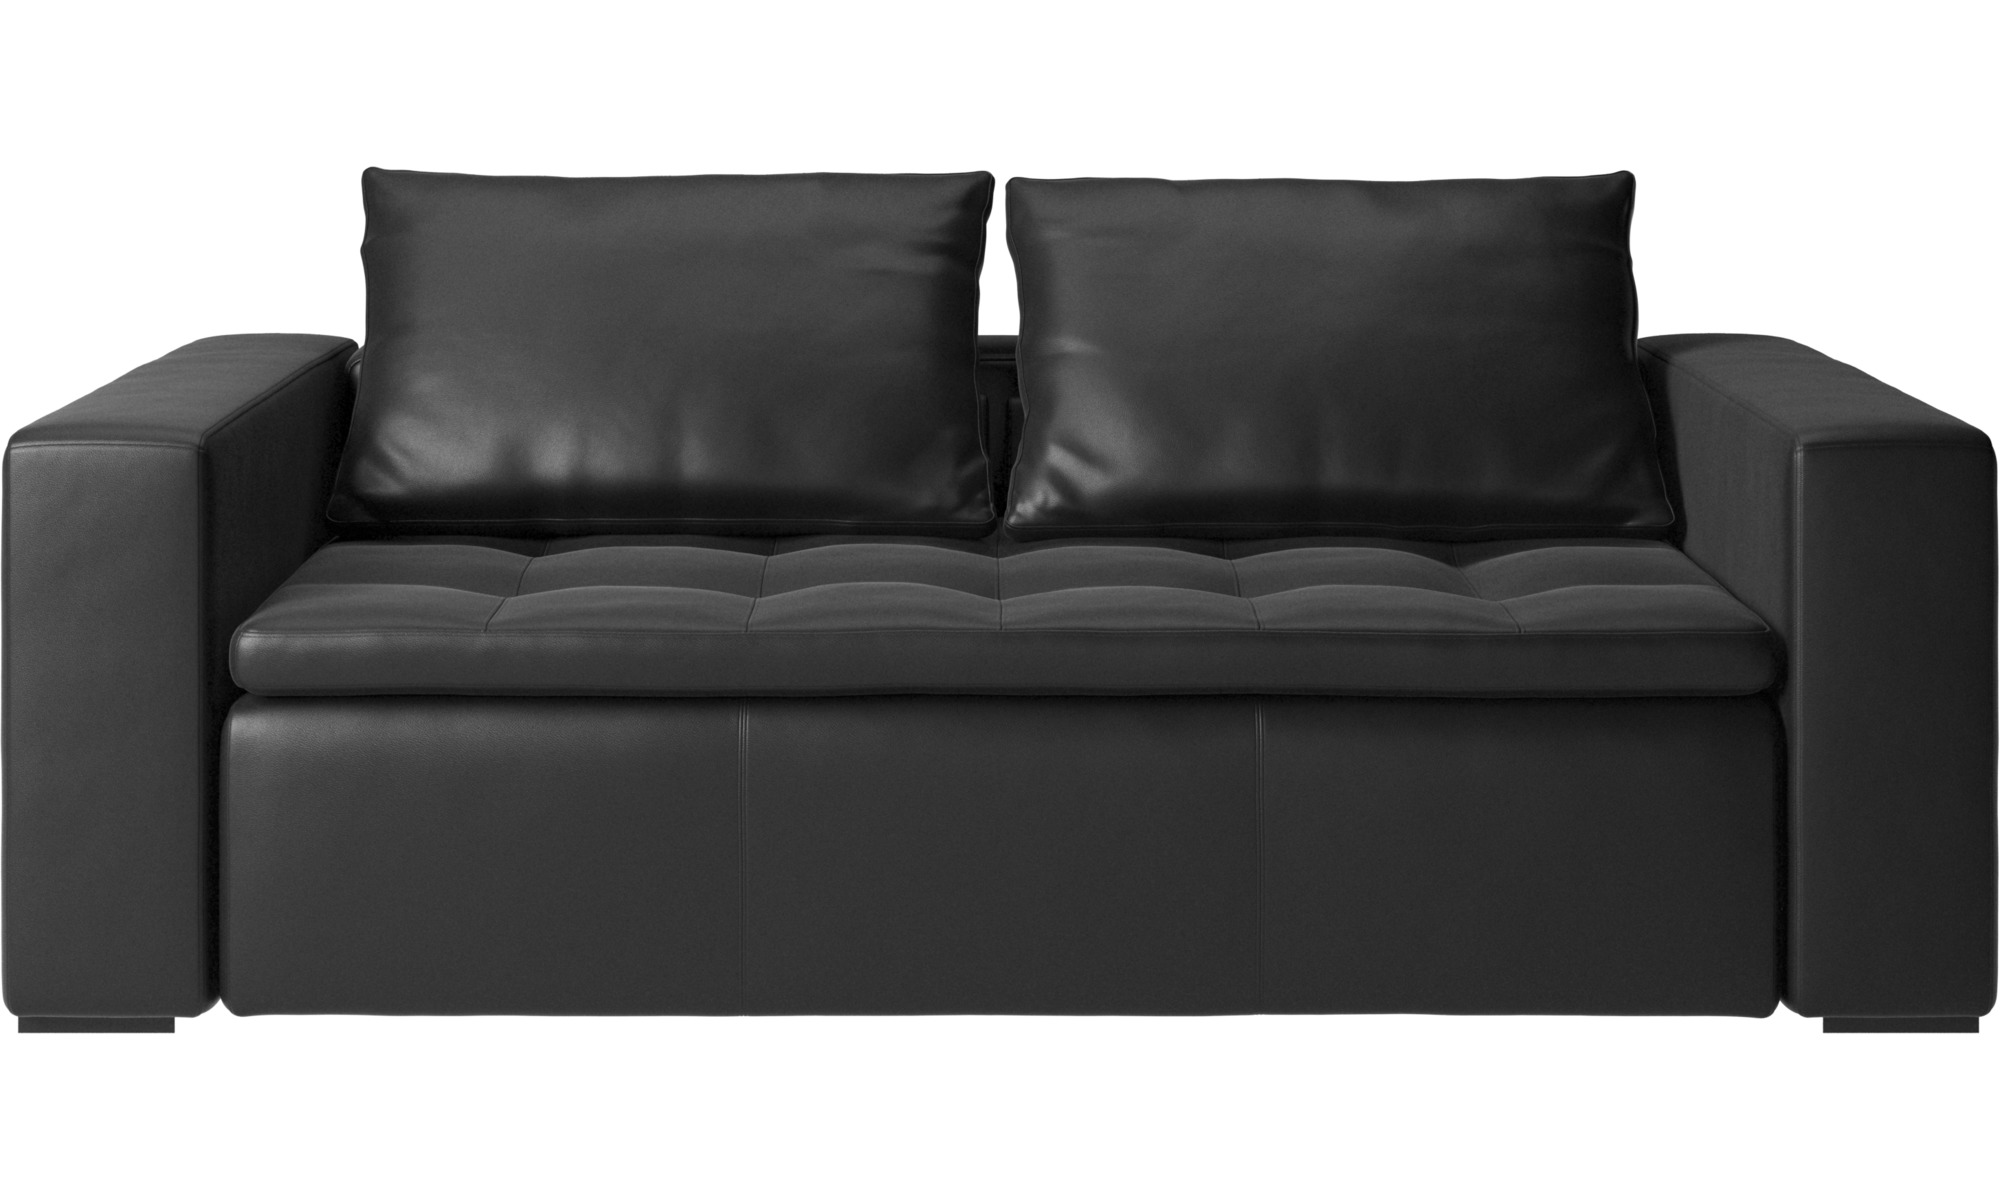 2 5 seater sofas mezzo sofa boconcept. Black Bedroom Furniture Sets. Home Design Ideas